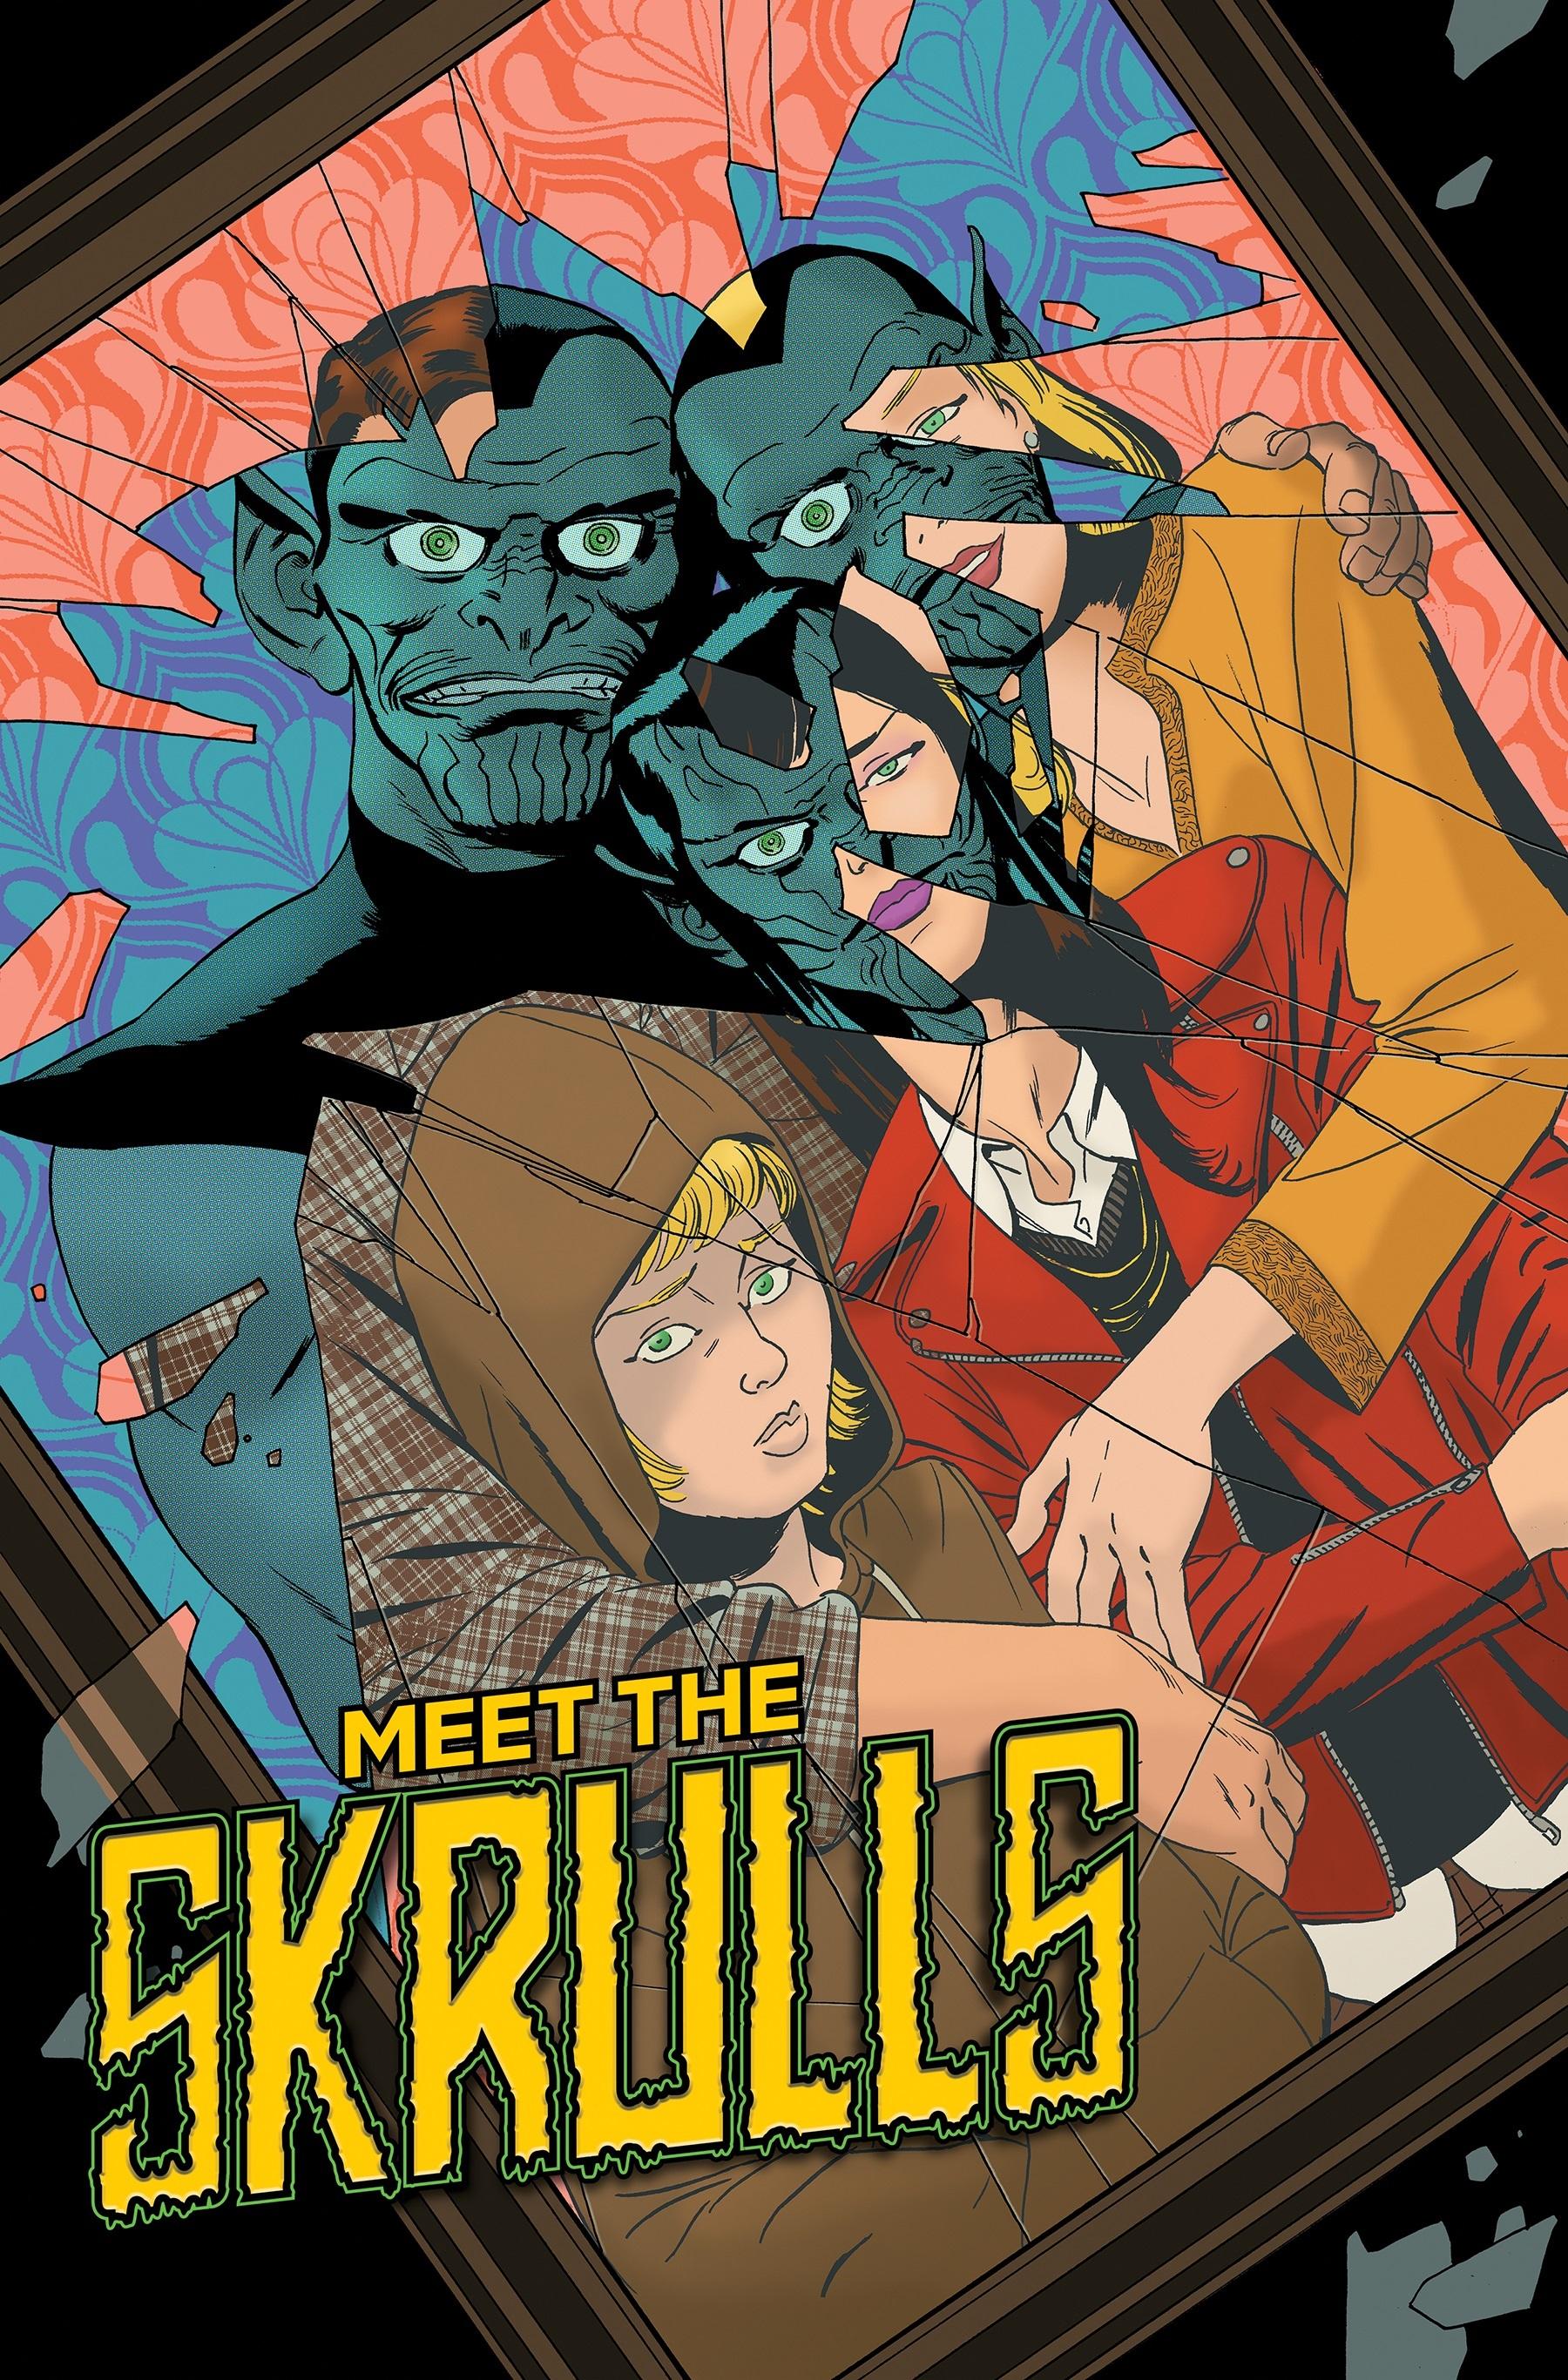 MEET THE SKRULLS TPB (Trade Paperback)